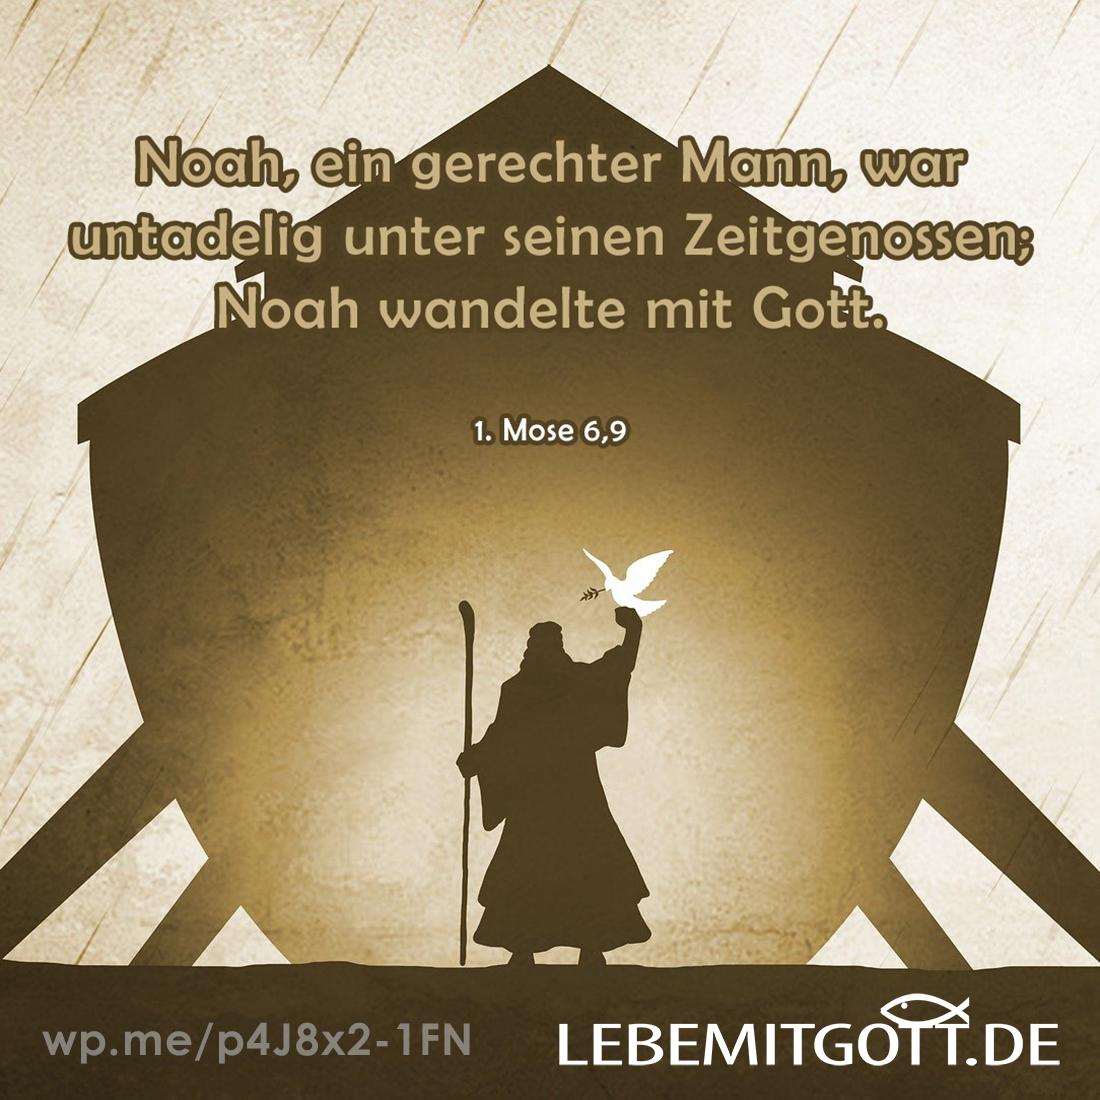 Noah wandelte mit Gott